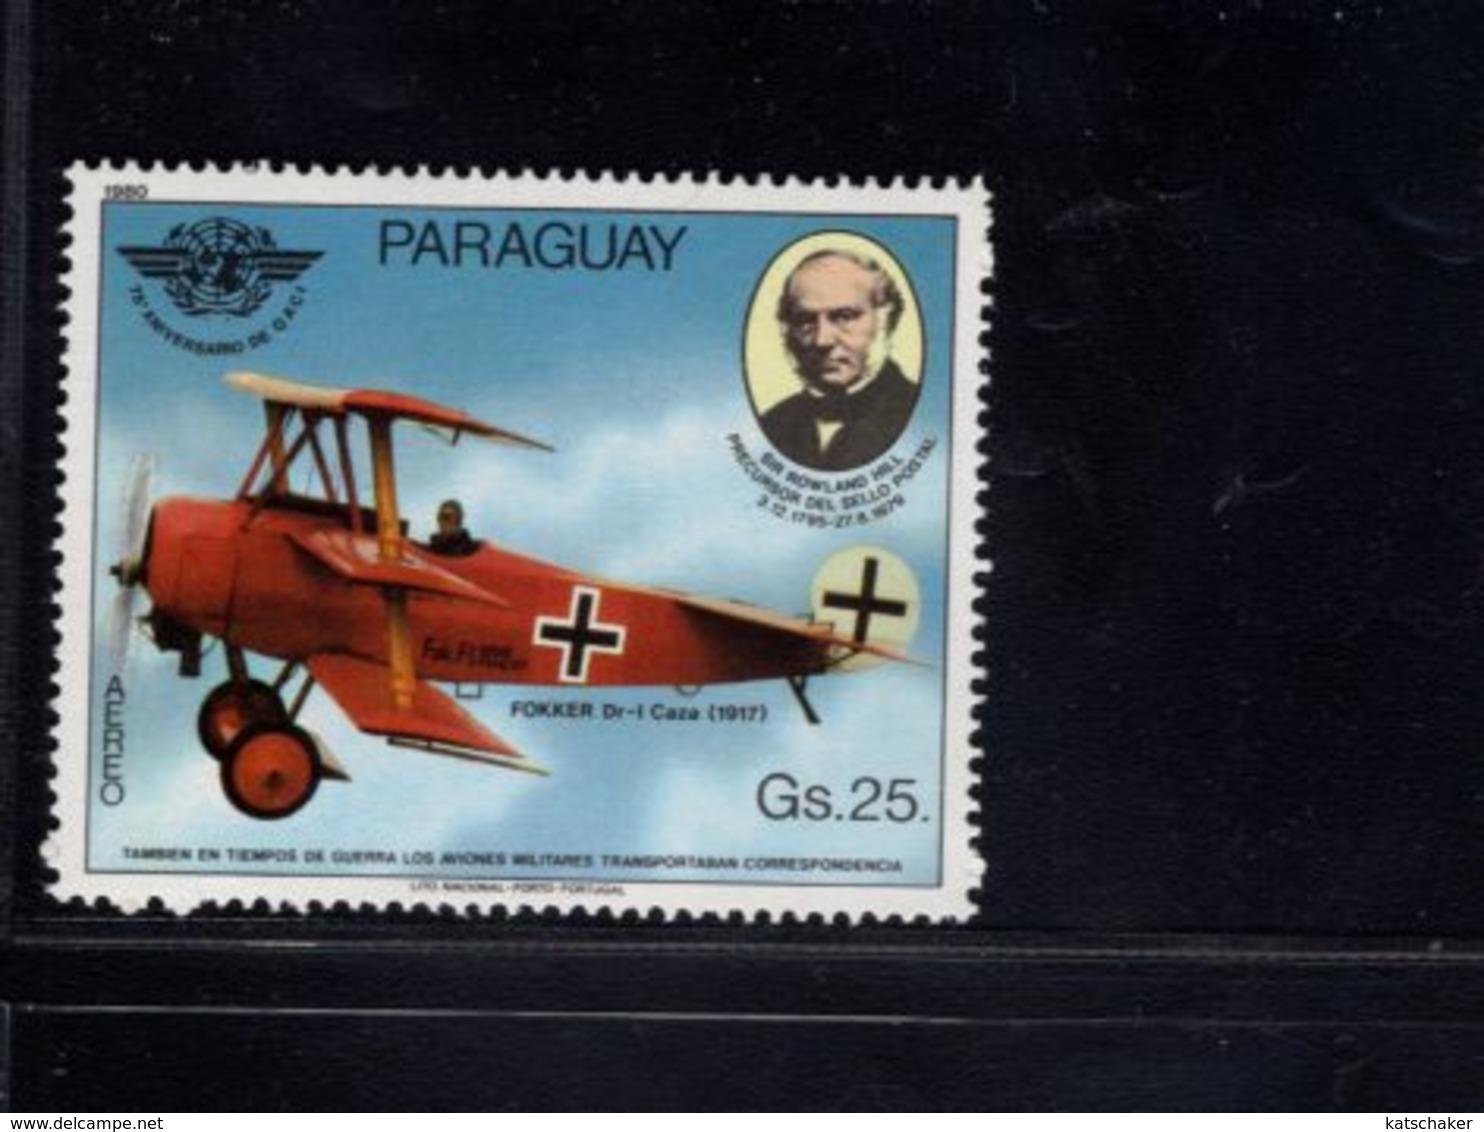 739908629  POSTFRIS MINT NEVER HINGED POSTFRISCH EINWANDFREI  SCOTT 1940 AIRPLANE FOKKER - Paraguay